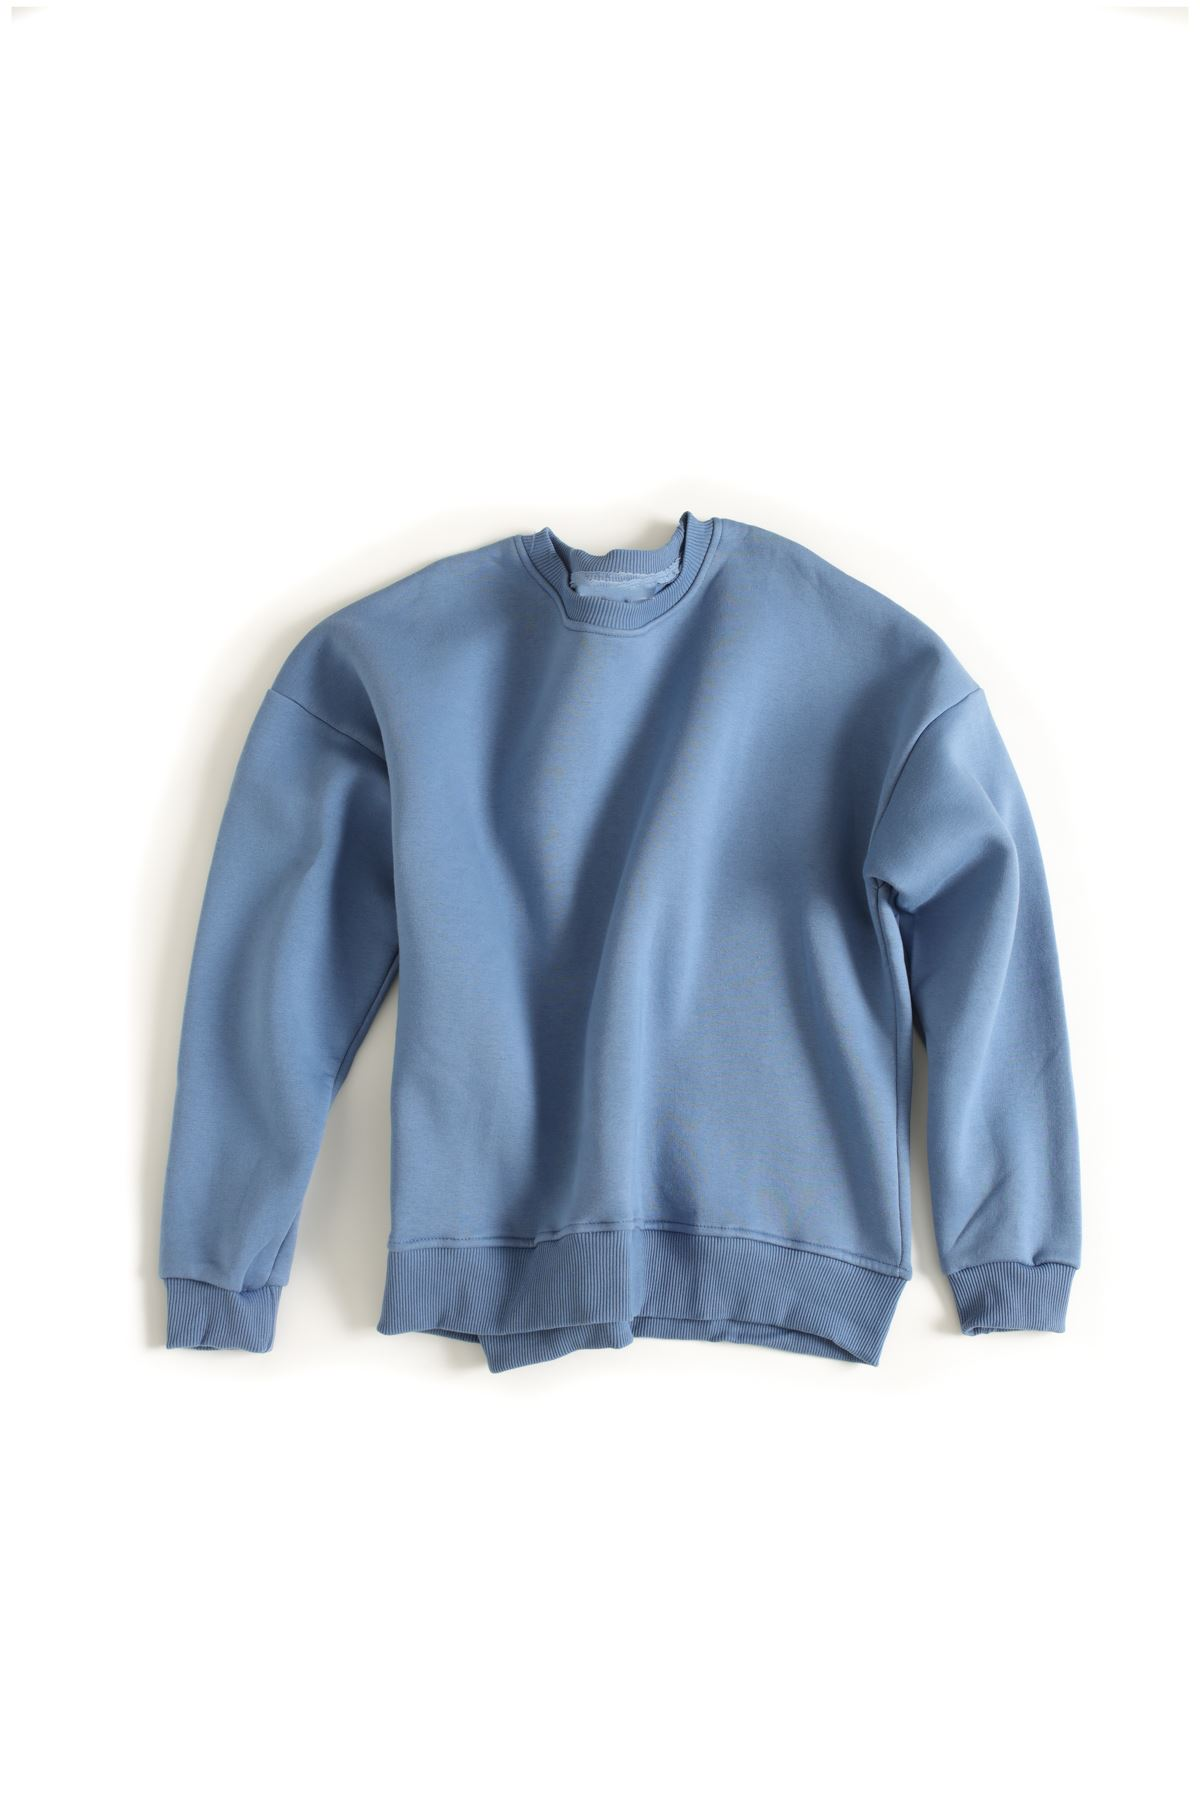 Oversize Mavi Basic Pamuklu Sweat